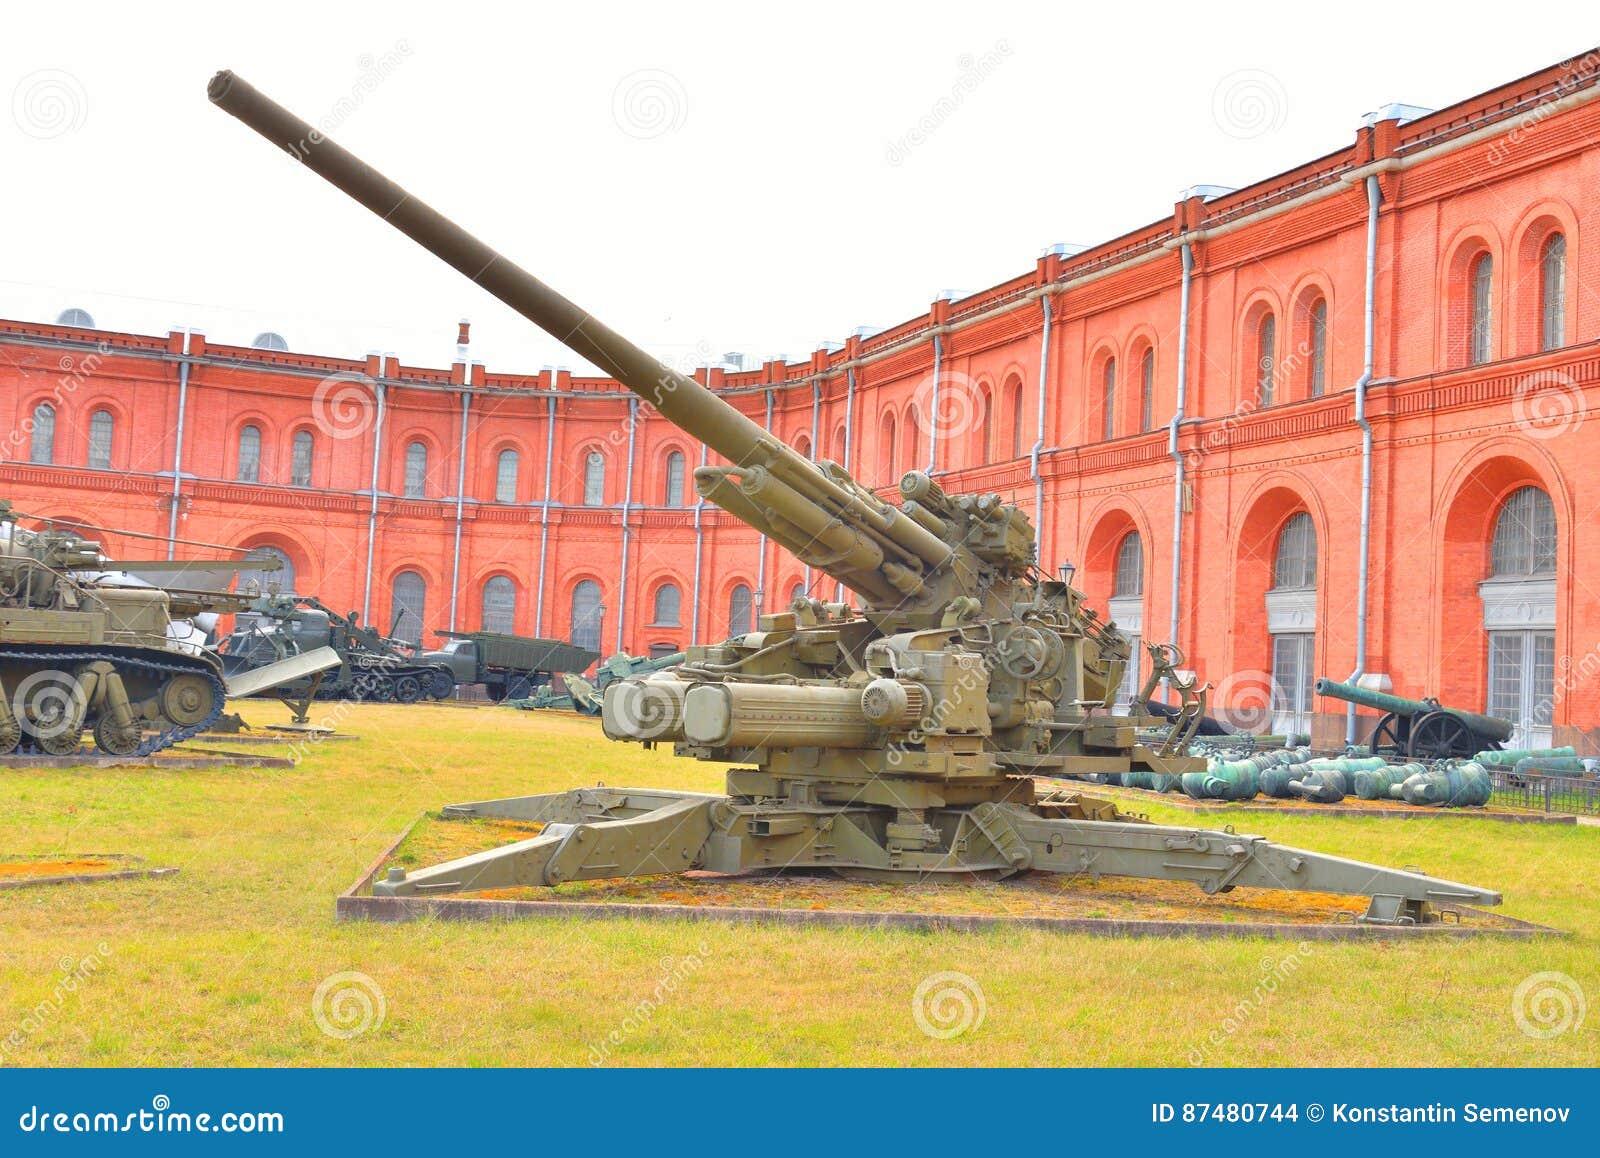 130mm高射炮KS-30在军事火炮博物馆